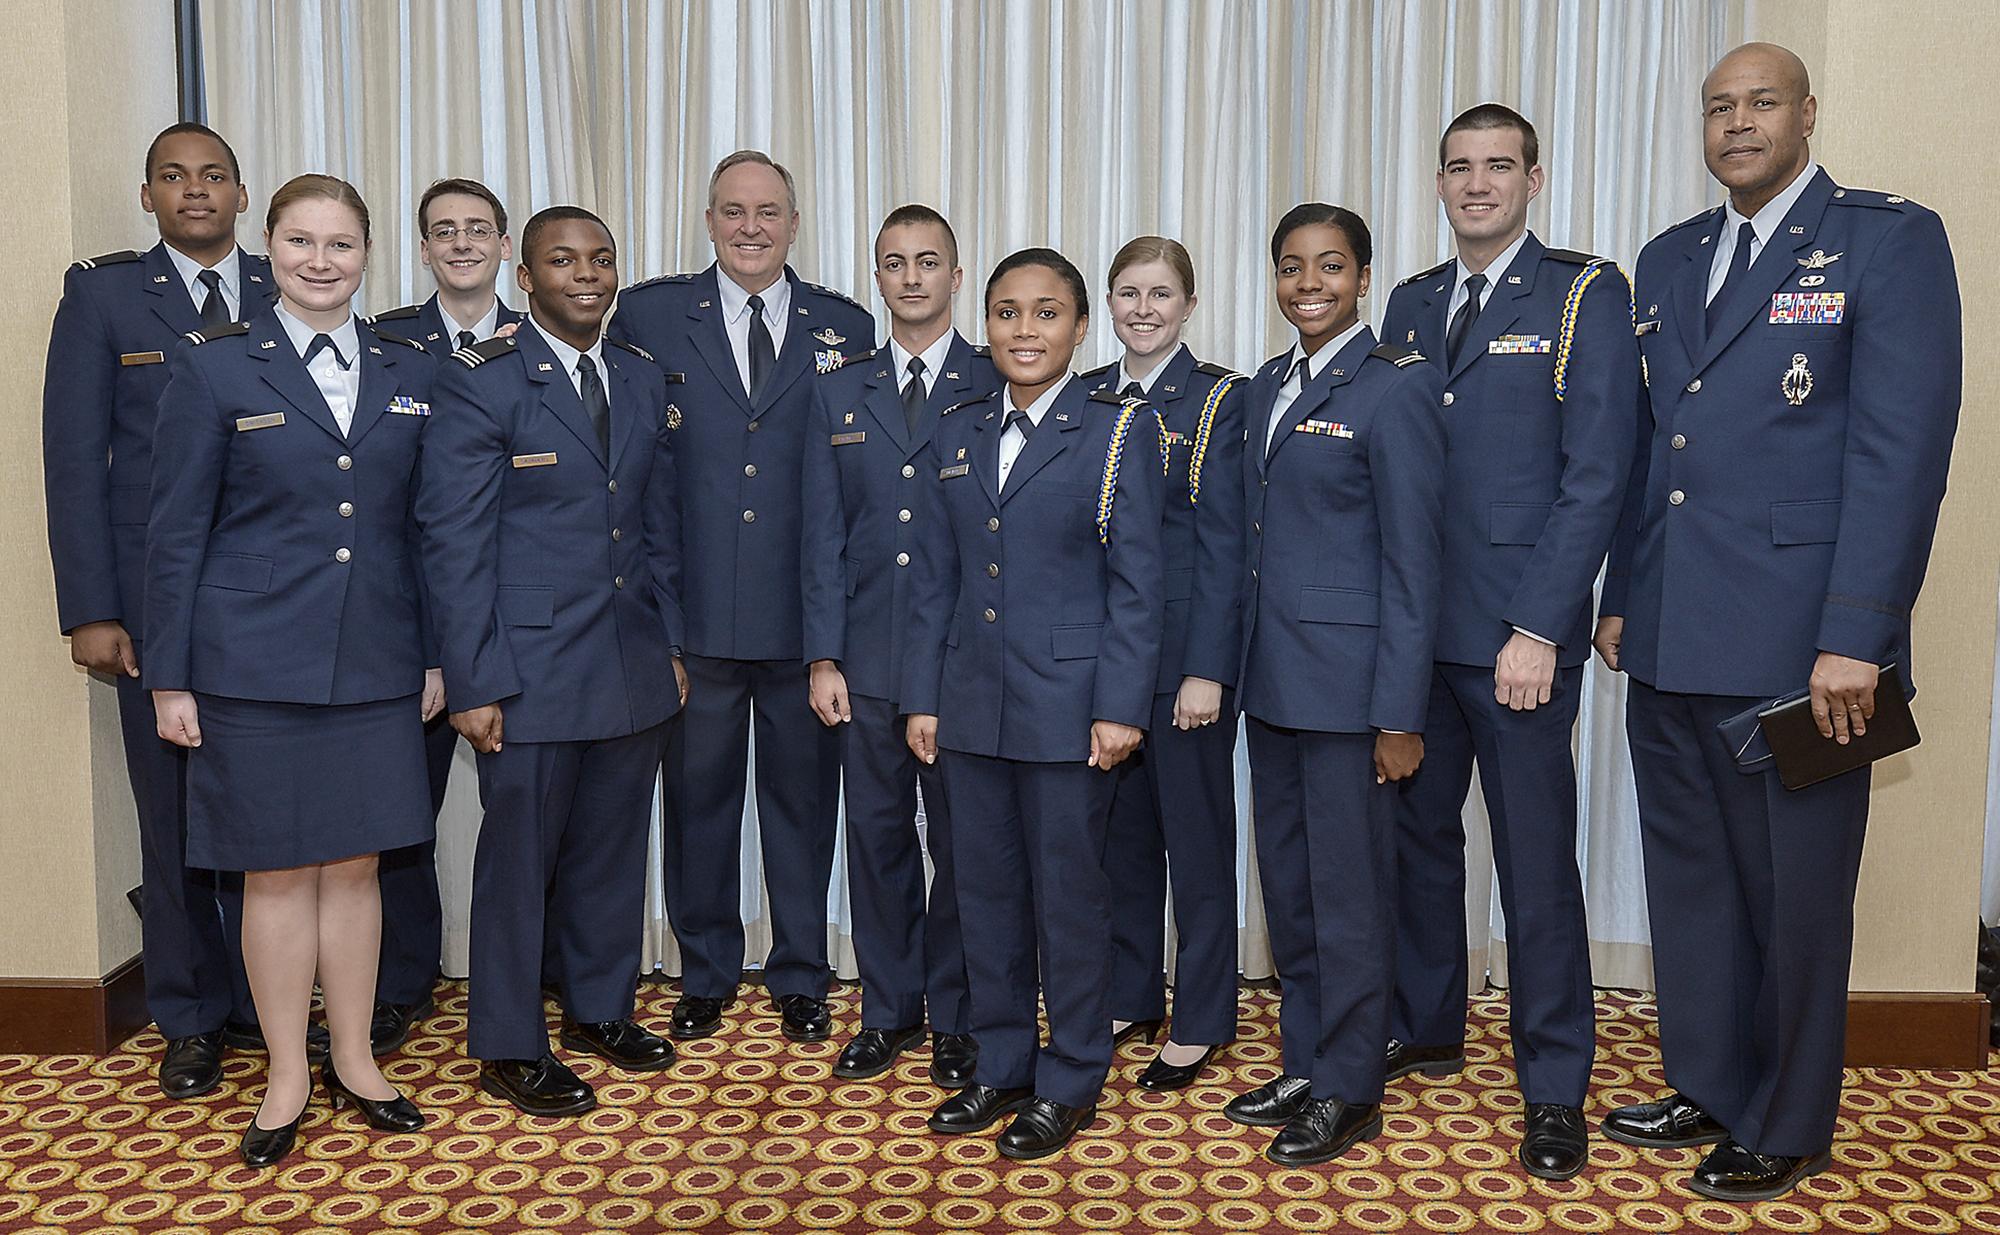 Air Force Uniform 2015